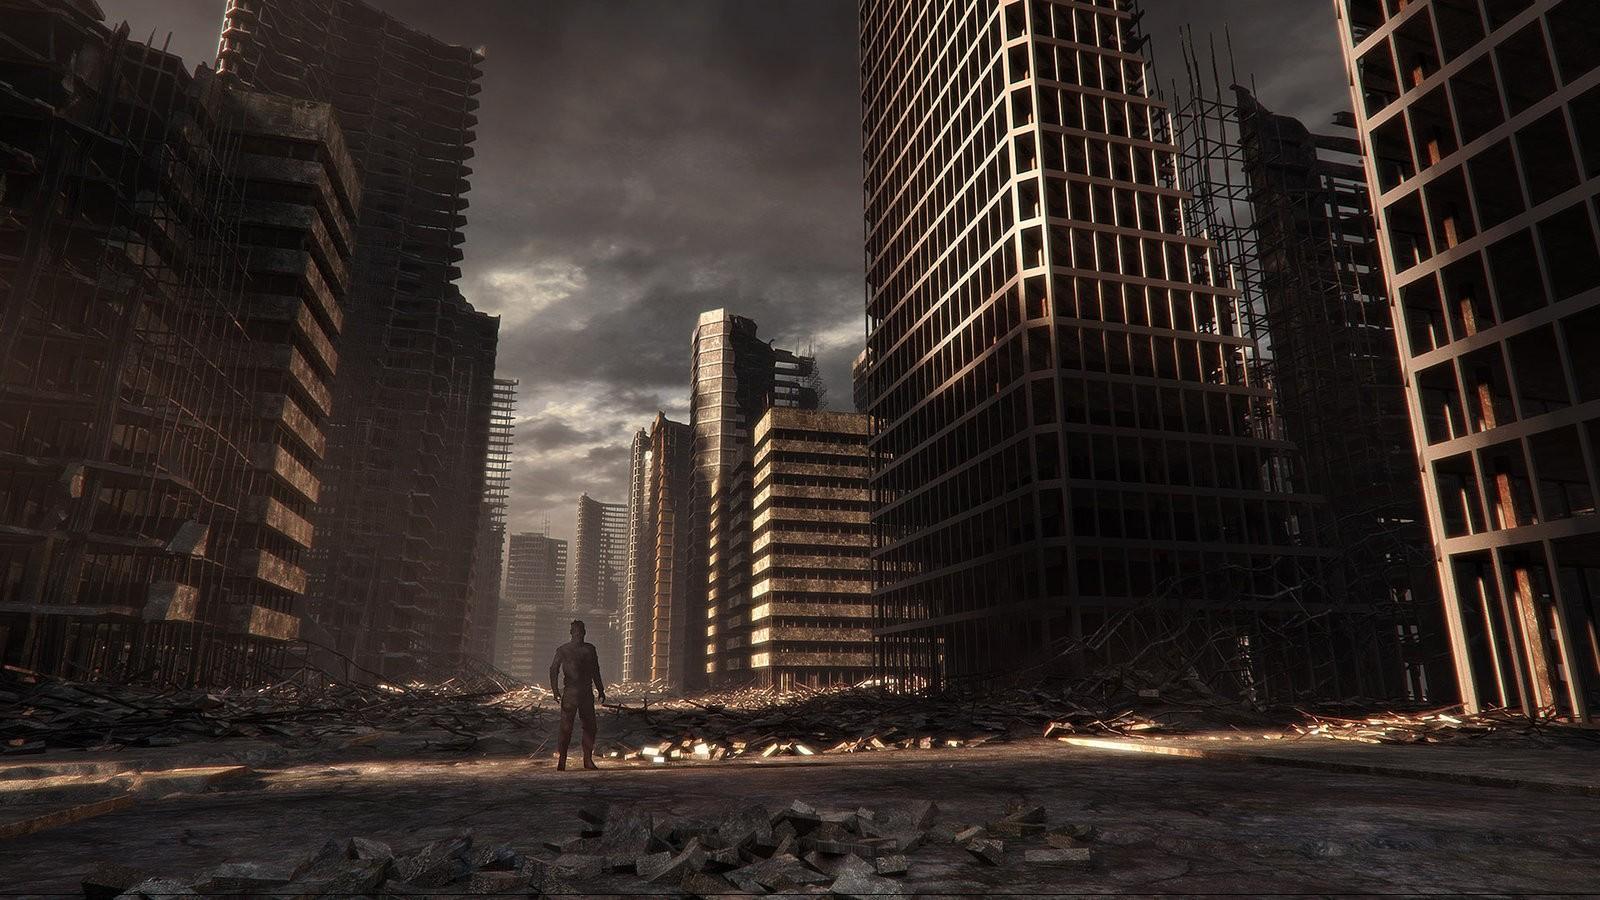 Post Apocalyptic Wallpapers HD - WallpaperSafari